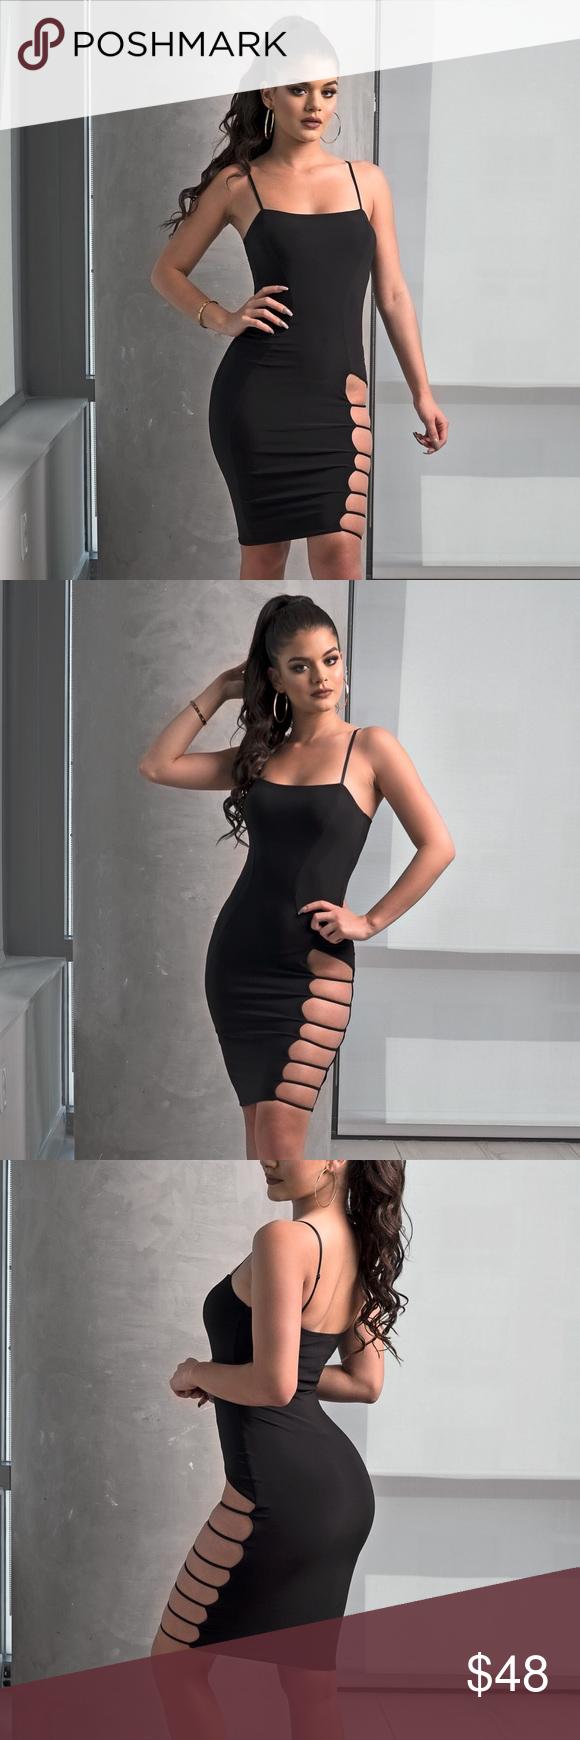 Black ladder cutout bodycon dress boutique side cuts body con